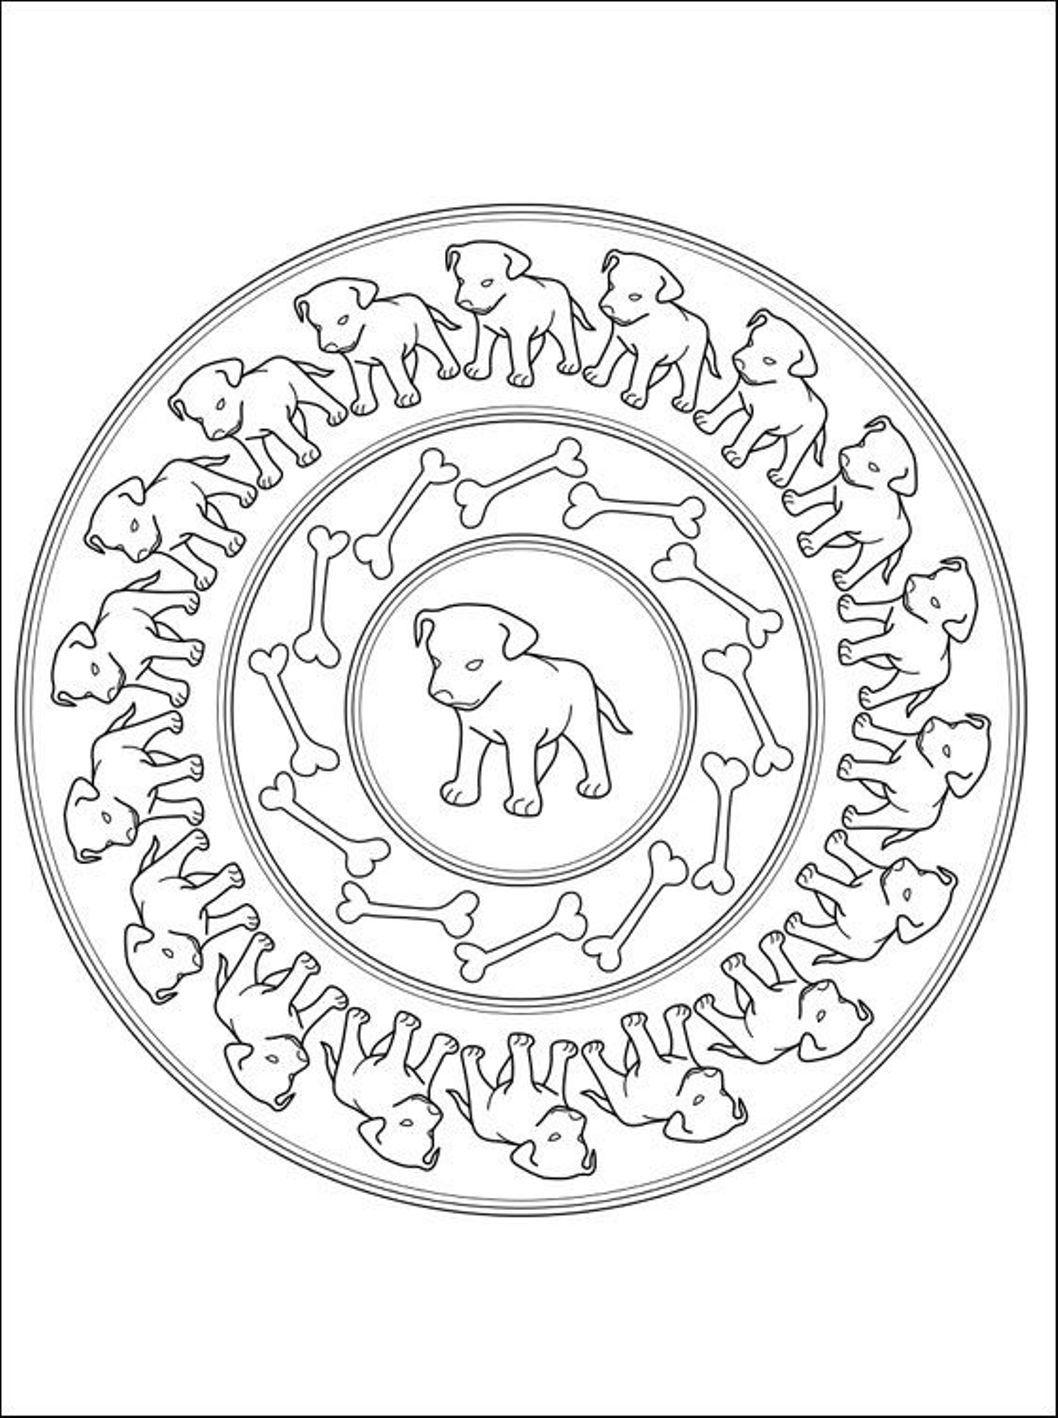 Uncategorized Mandala Coloring Pages For S Free mandala coloring pages for s murderthestout puppies kids